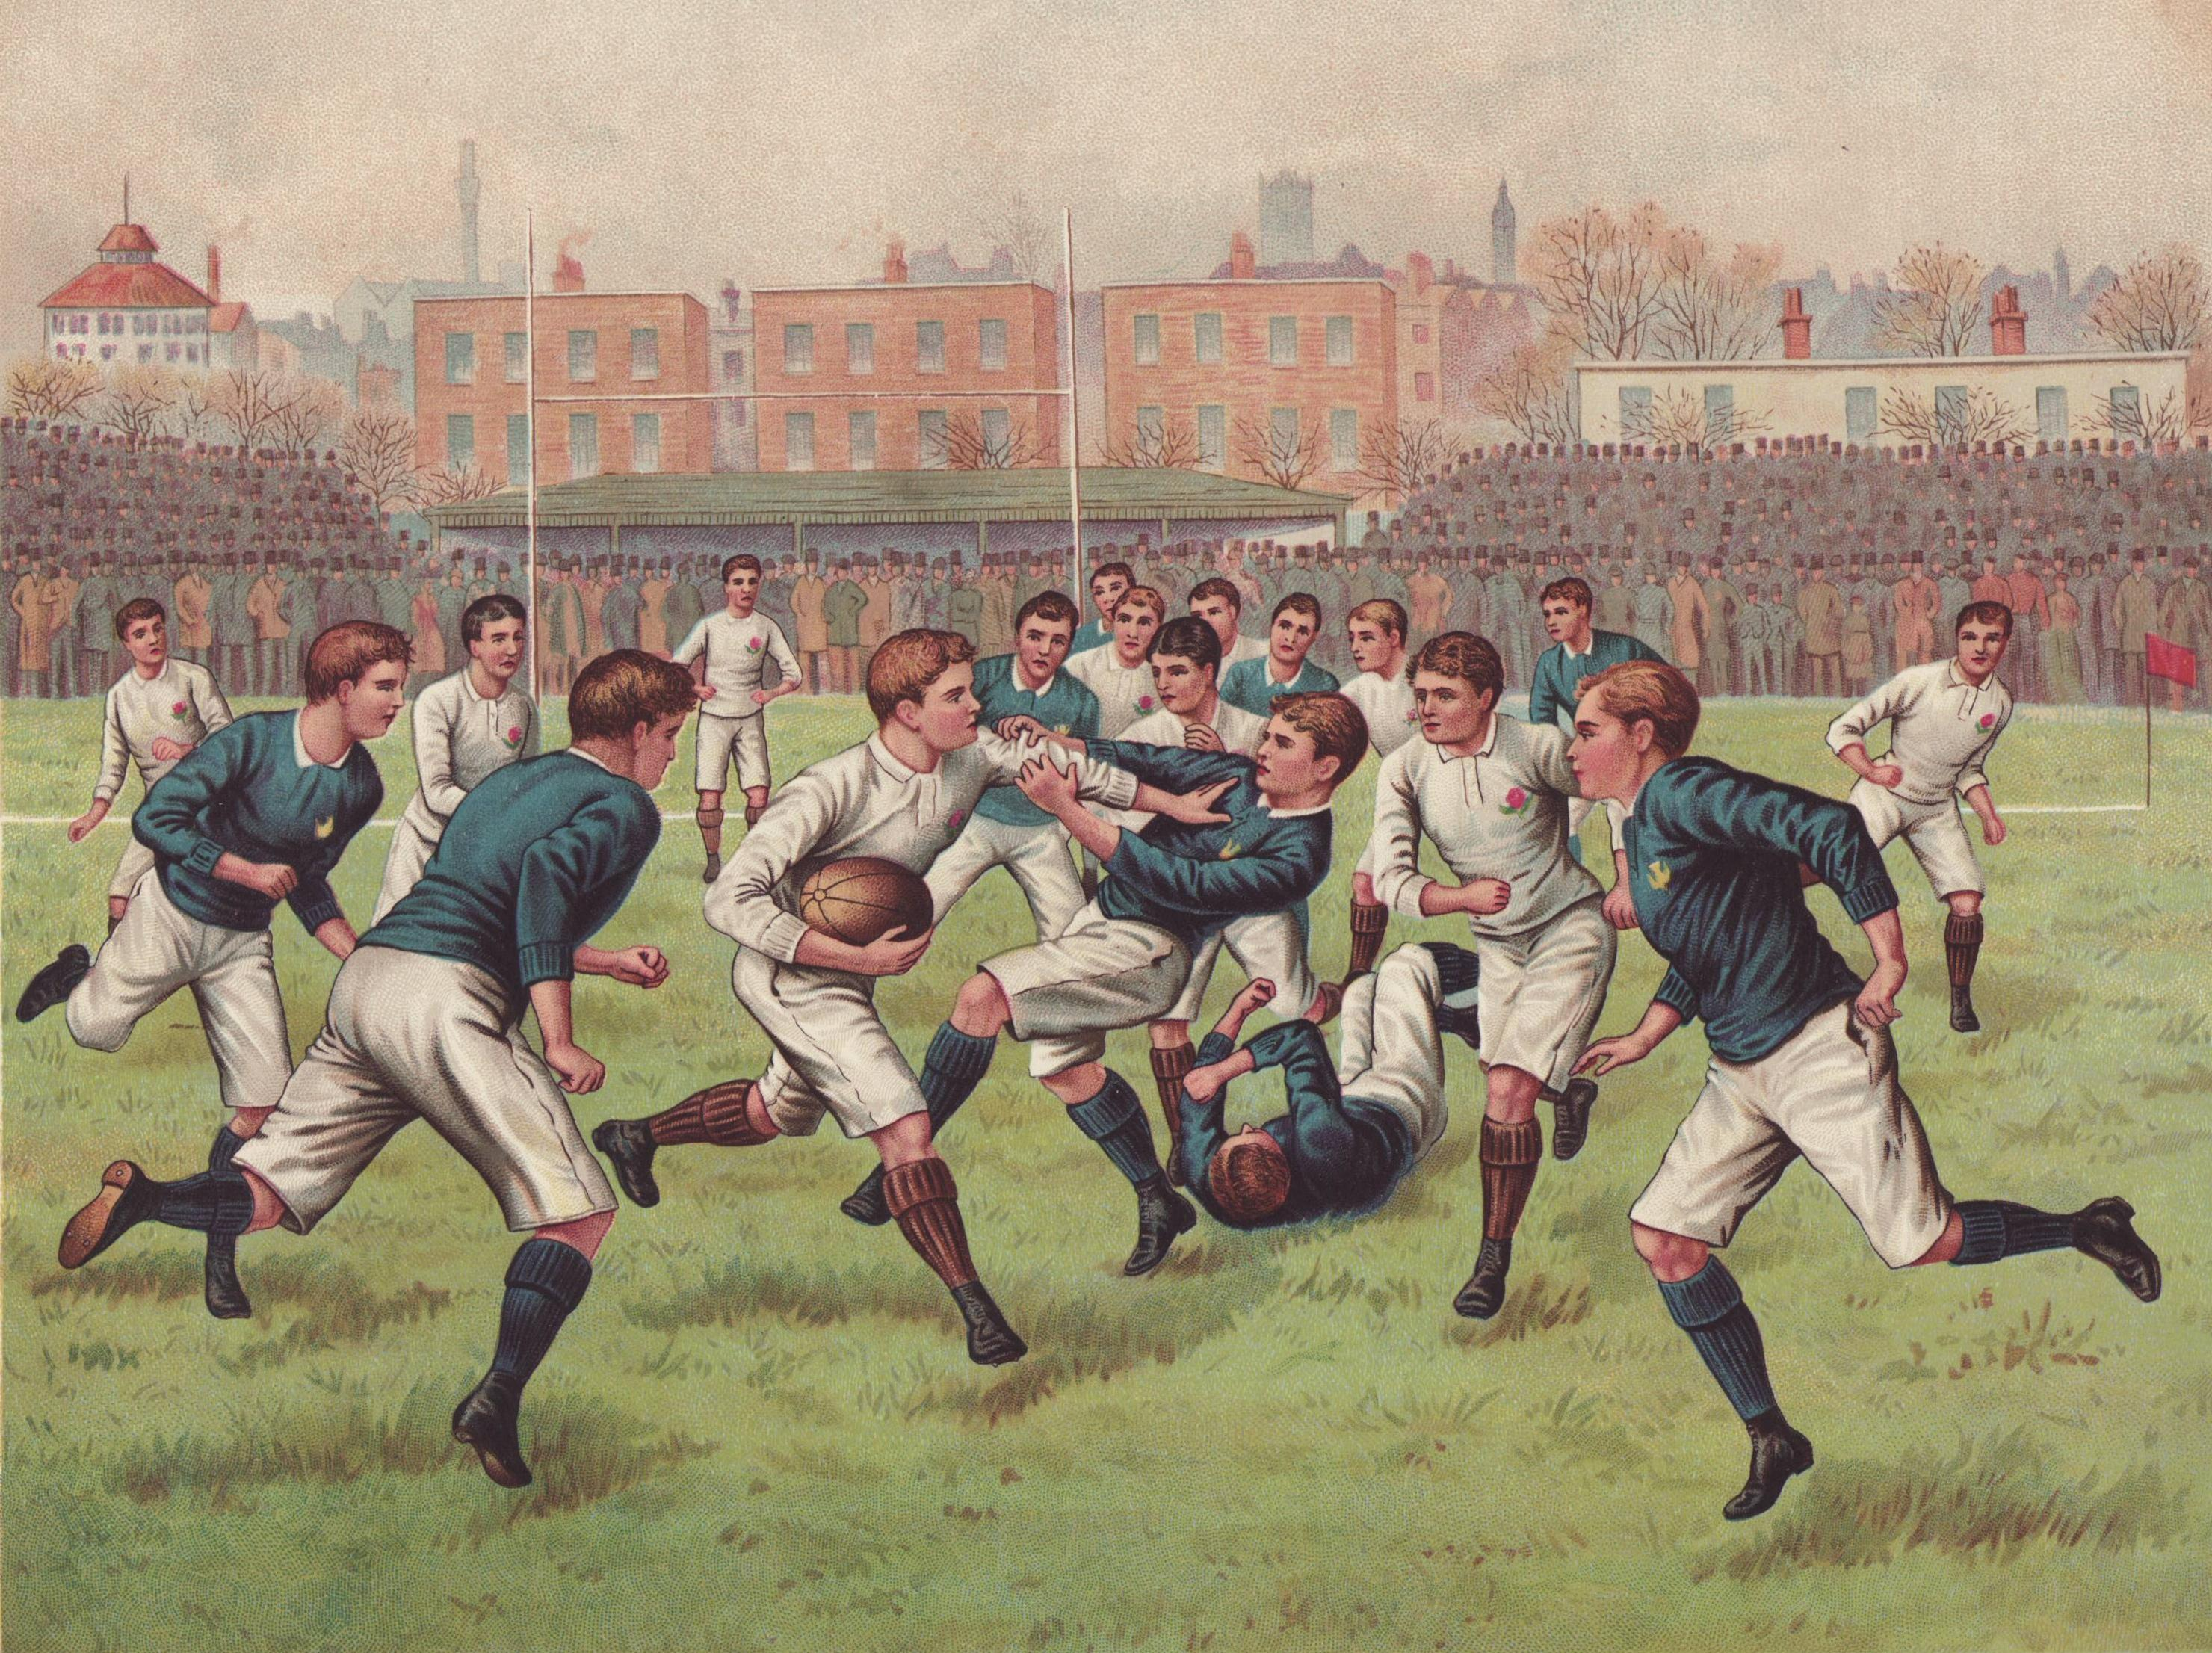 Folkets sport